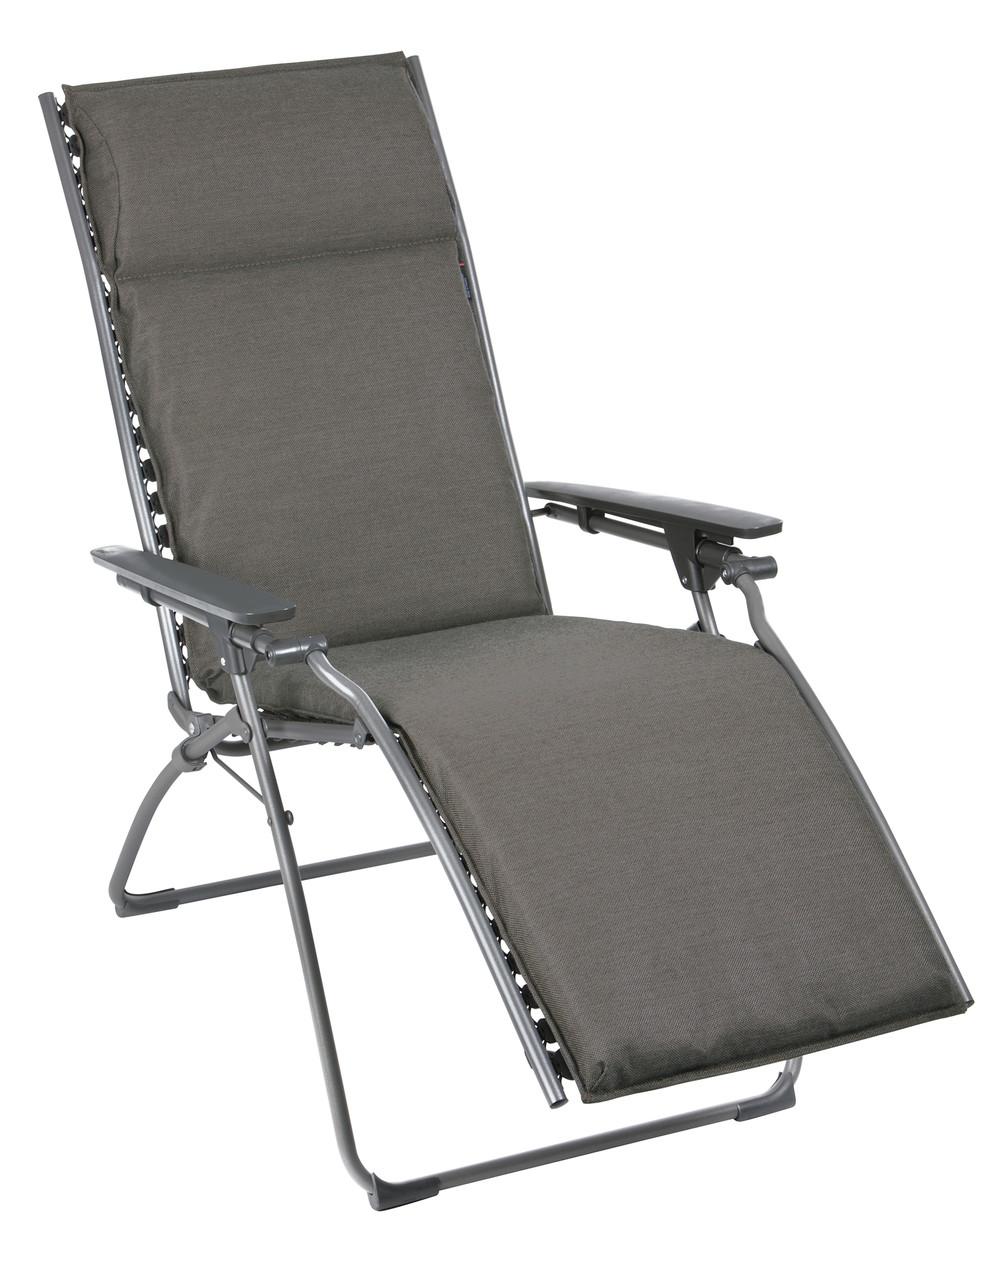 Outdoor anti gravity chair - Lafuma Evolution Hedona Privilege Zero Gravity Chair Recliner